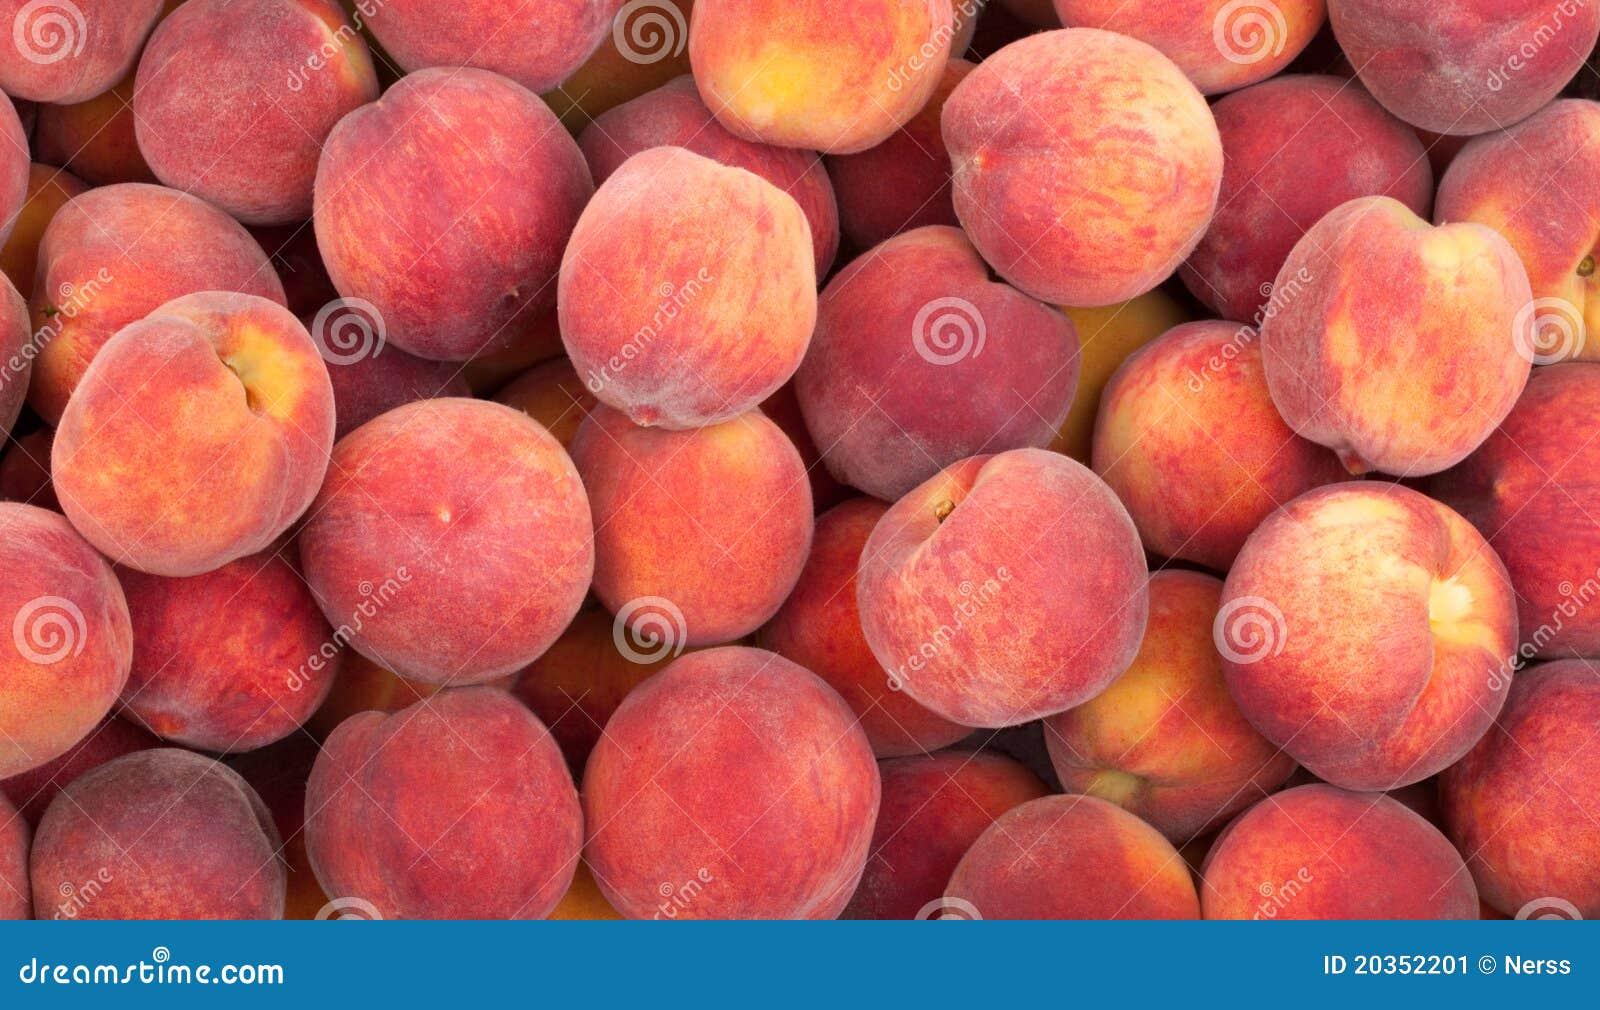 Peach fruits background